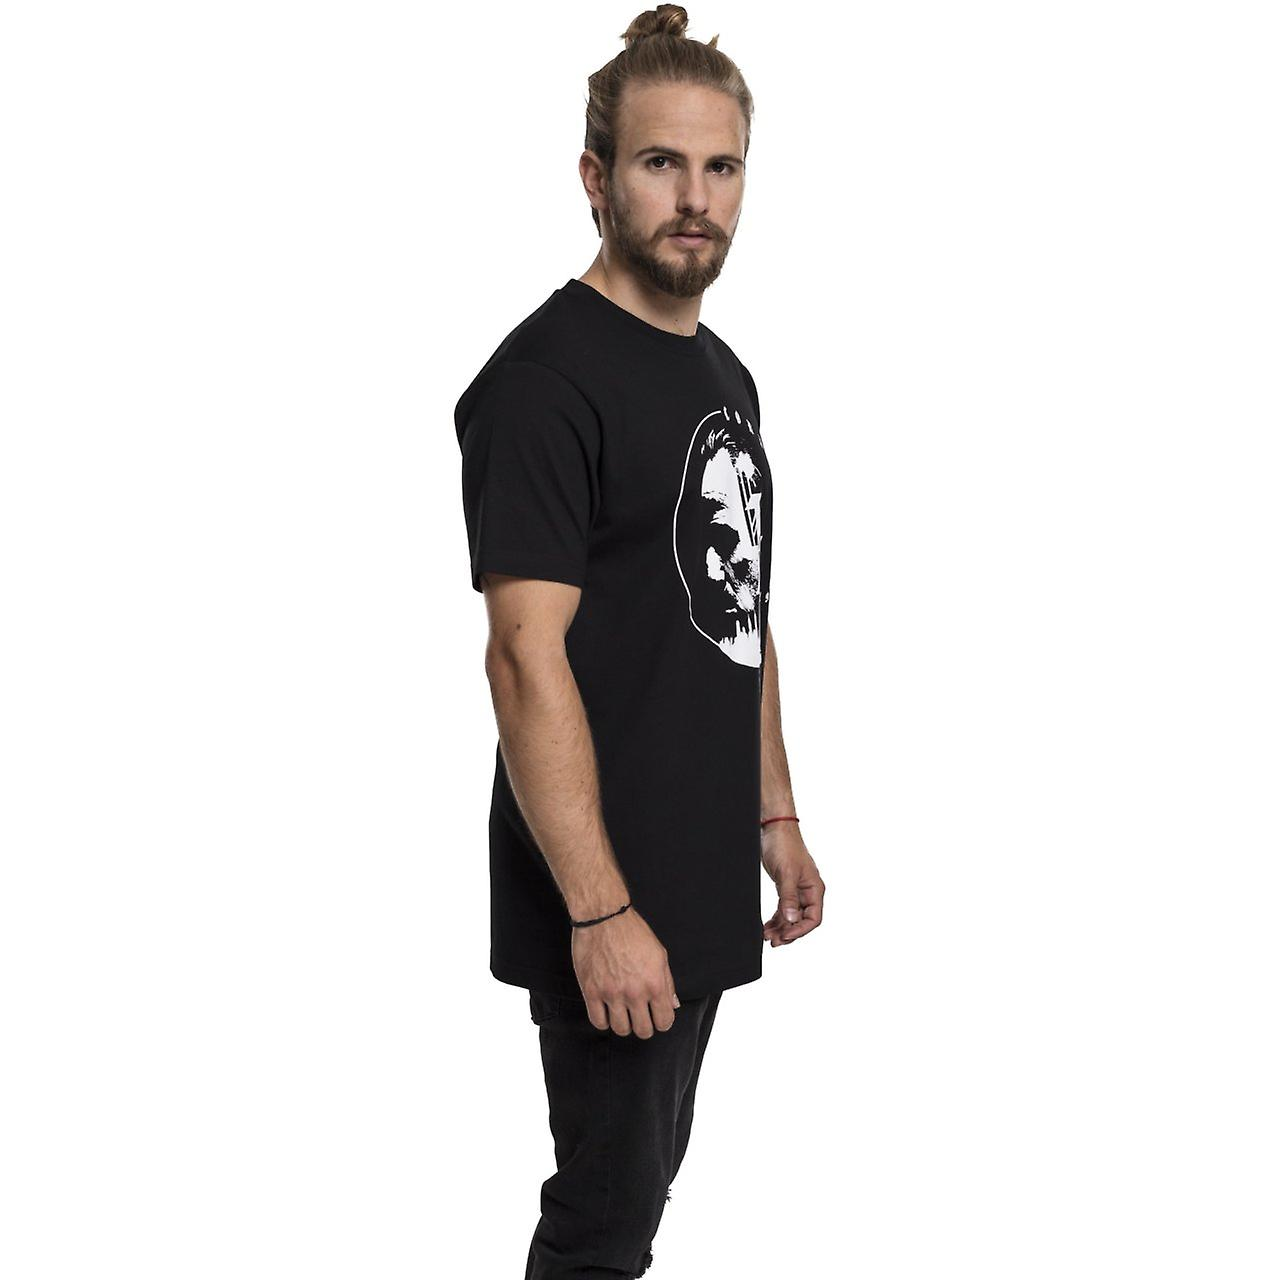 Merchcode shirt - Godfather circle shirt black